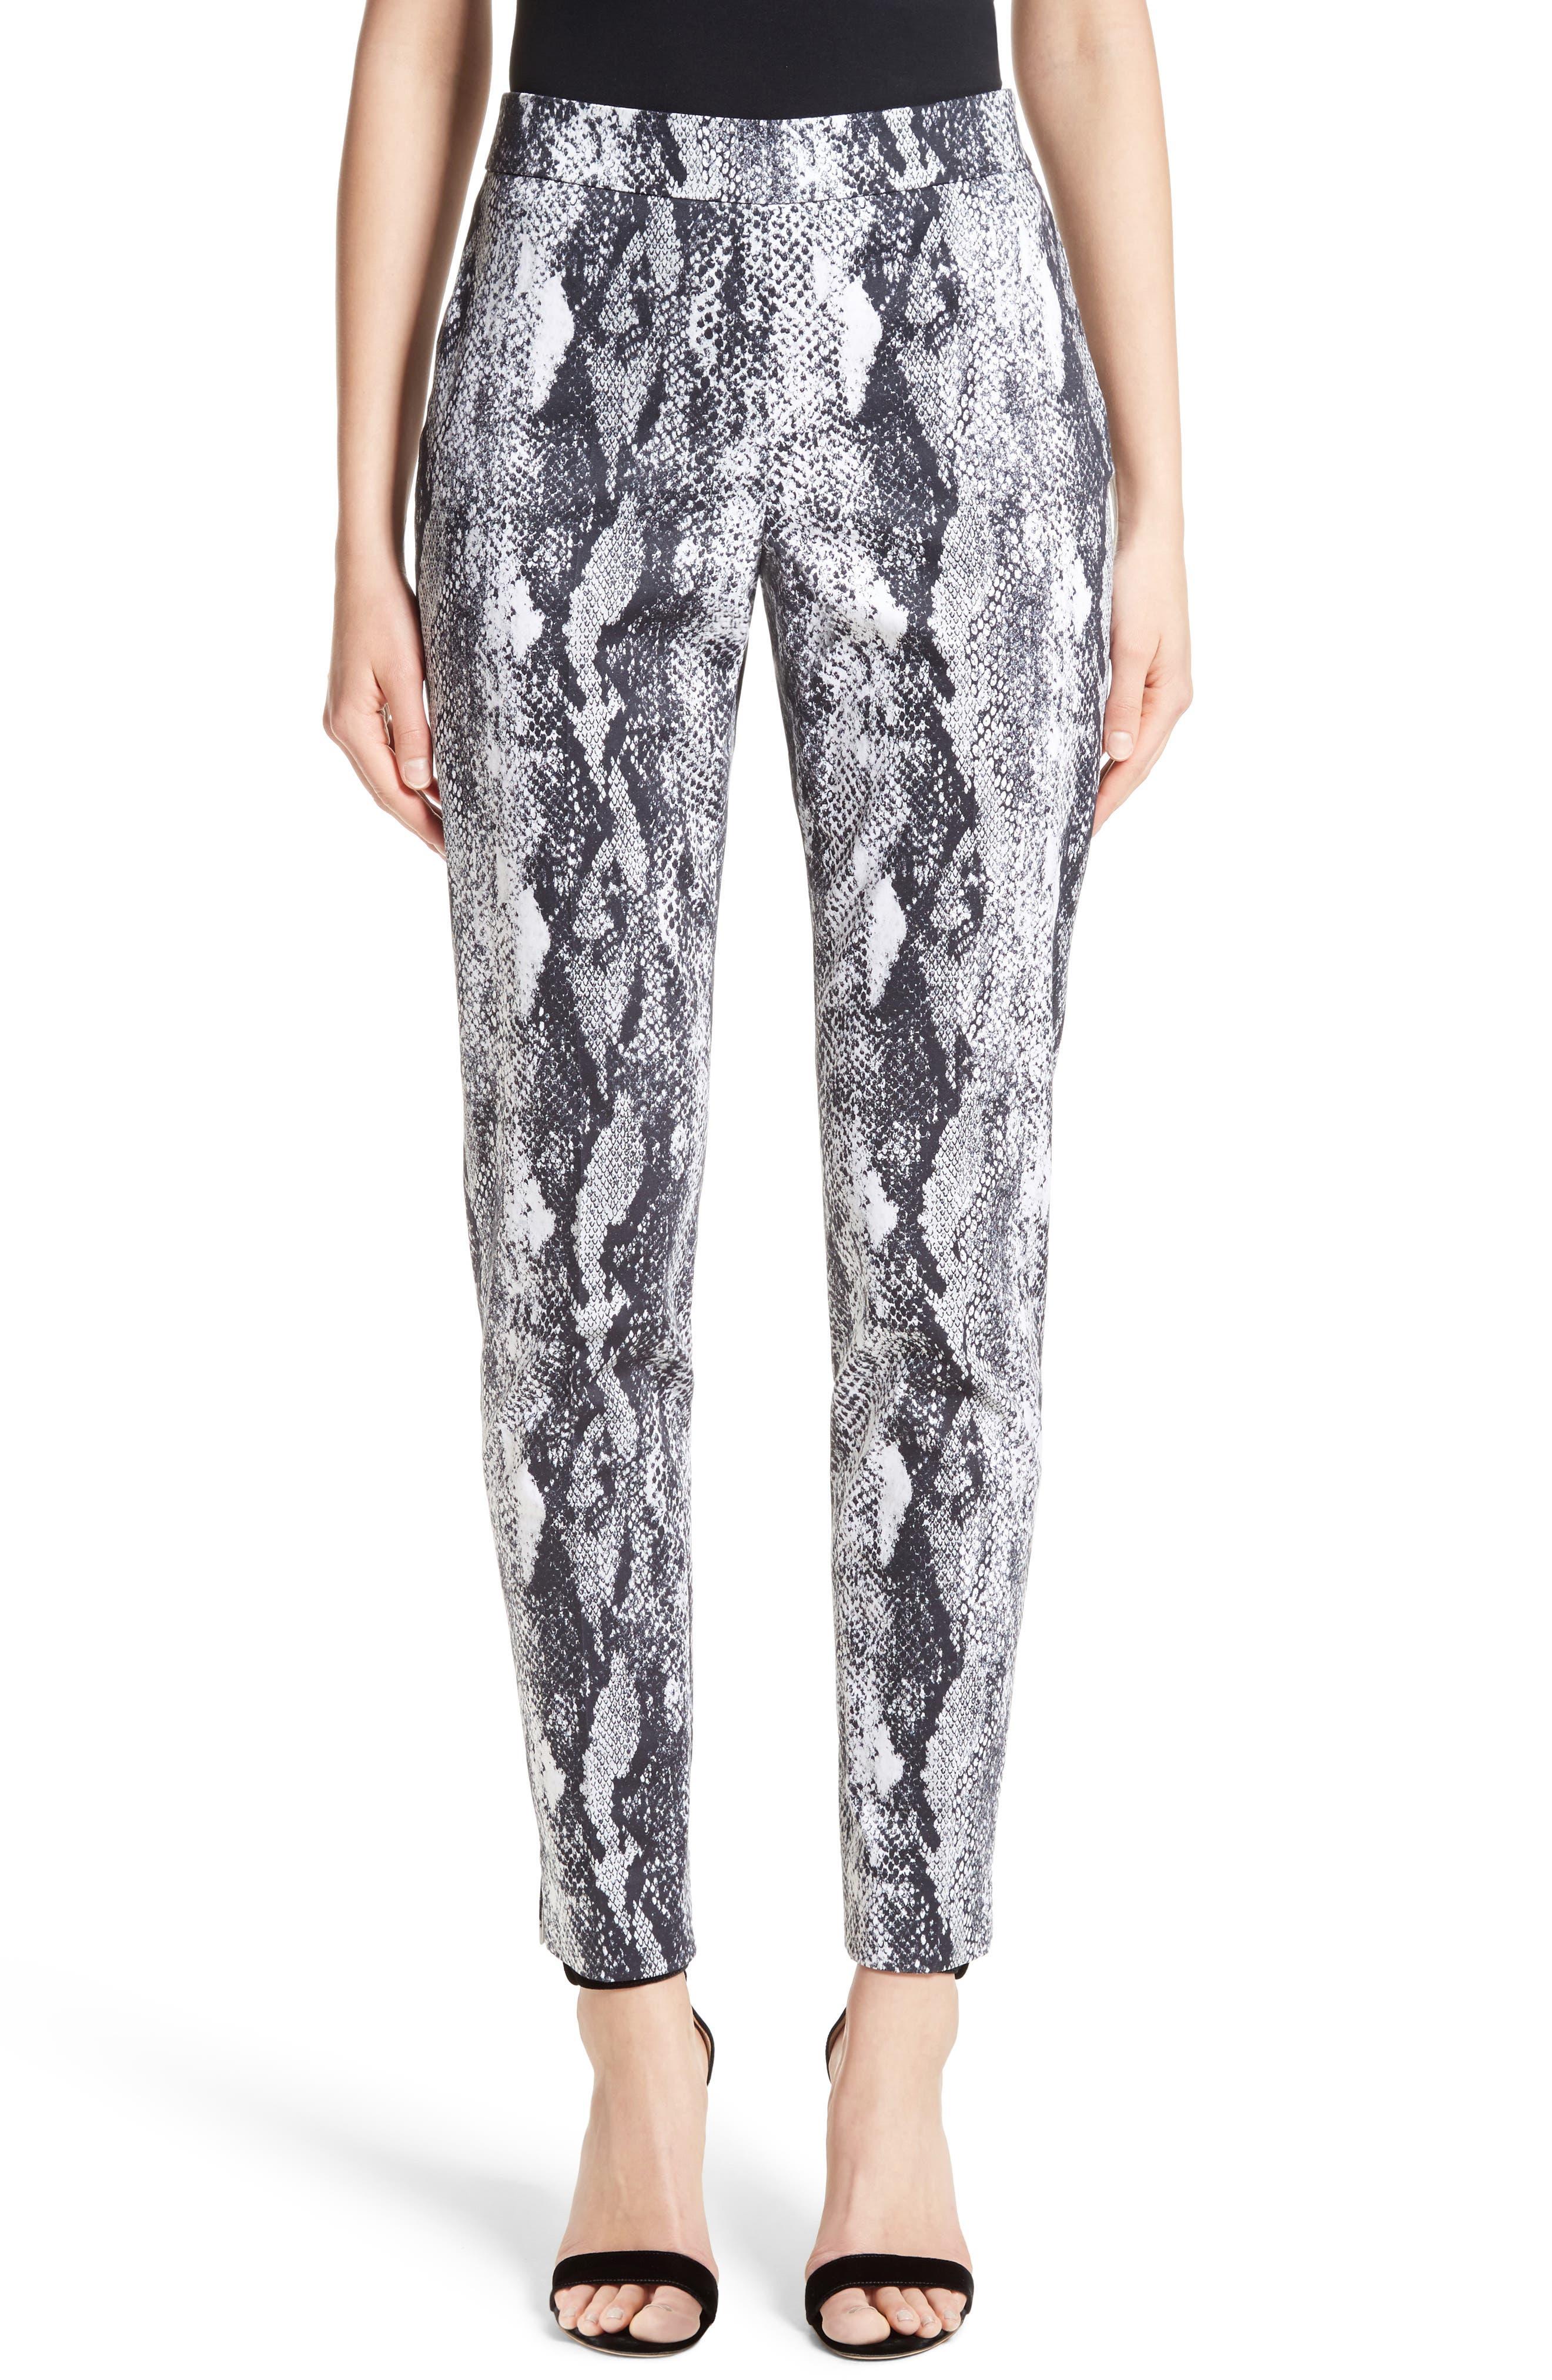 Emma Raja Snakeskin Print Pants,                         Main,                         color, 050